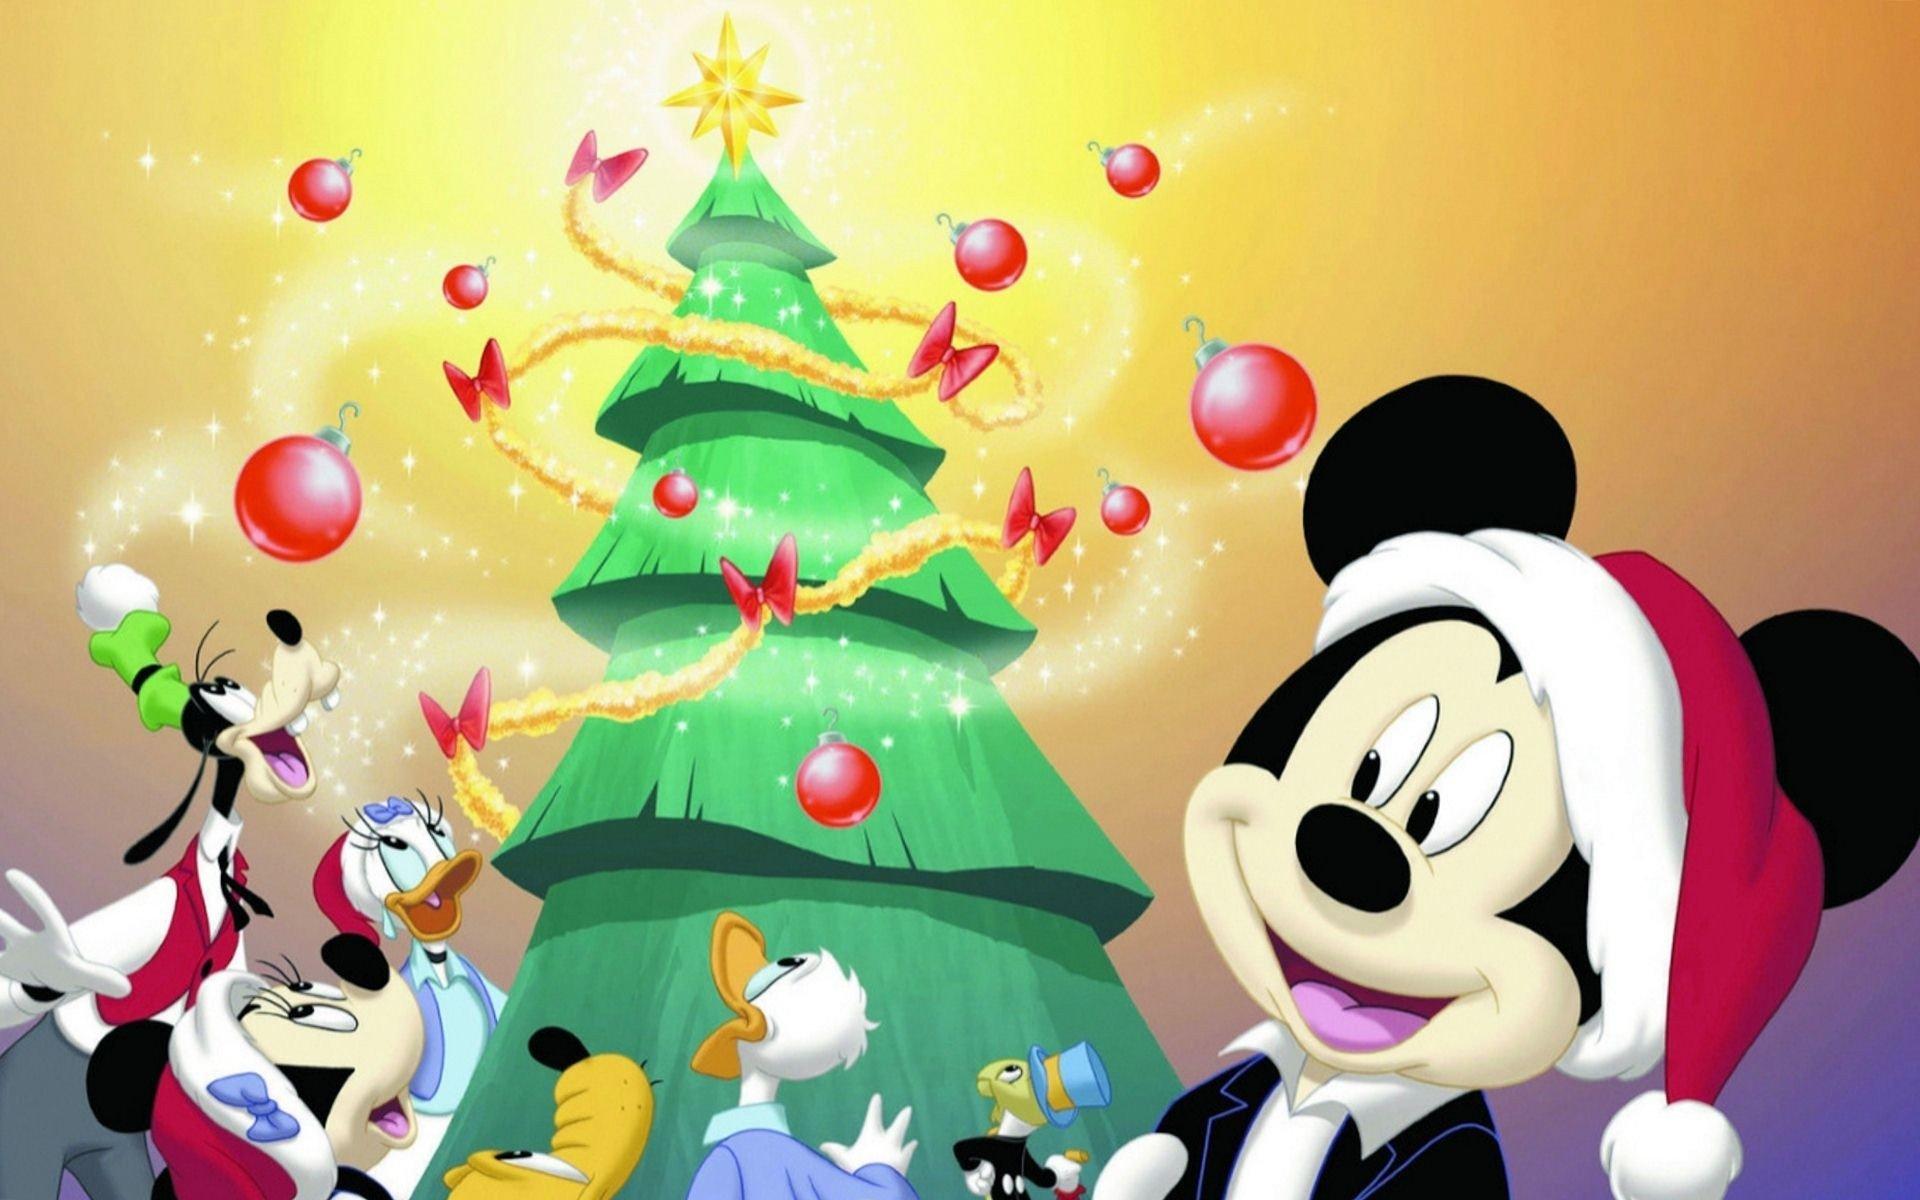 Fond D écran Vacances De Noël: Fond D'écran : 1920 X 1200 Px, Noël, Disney, Vacances